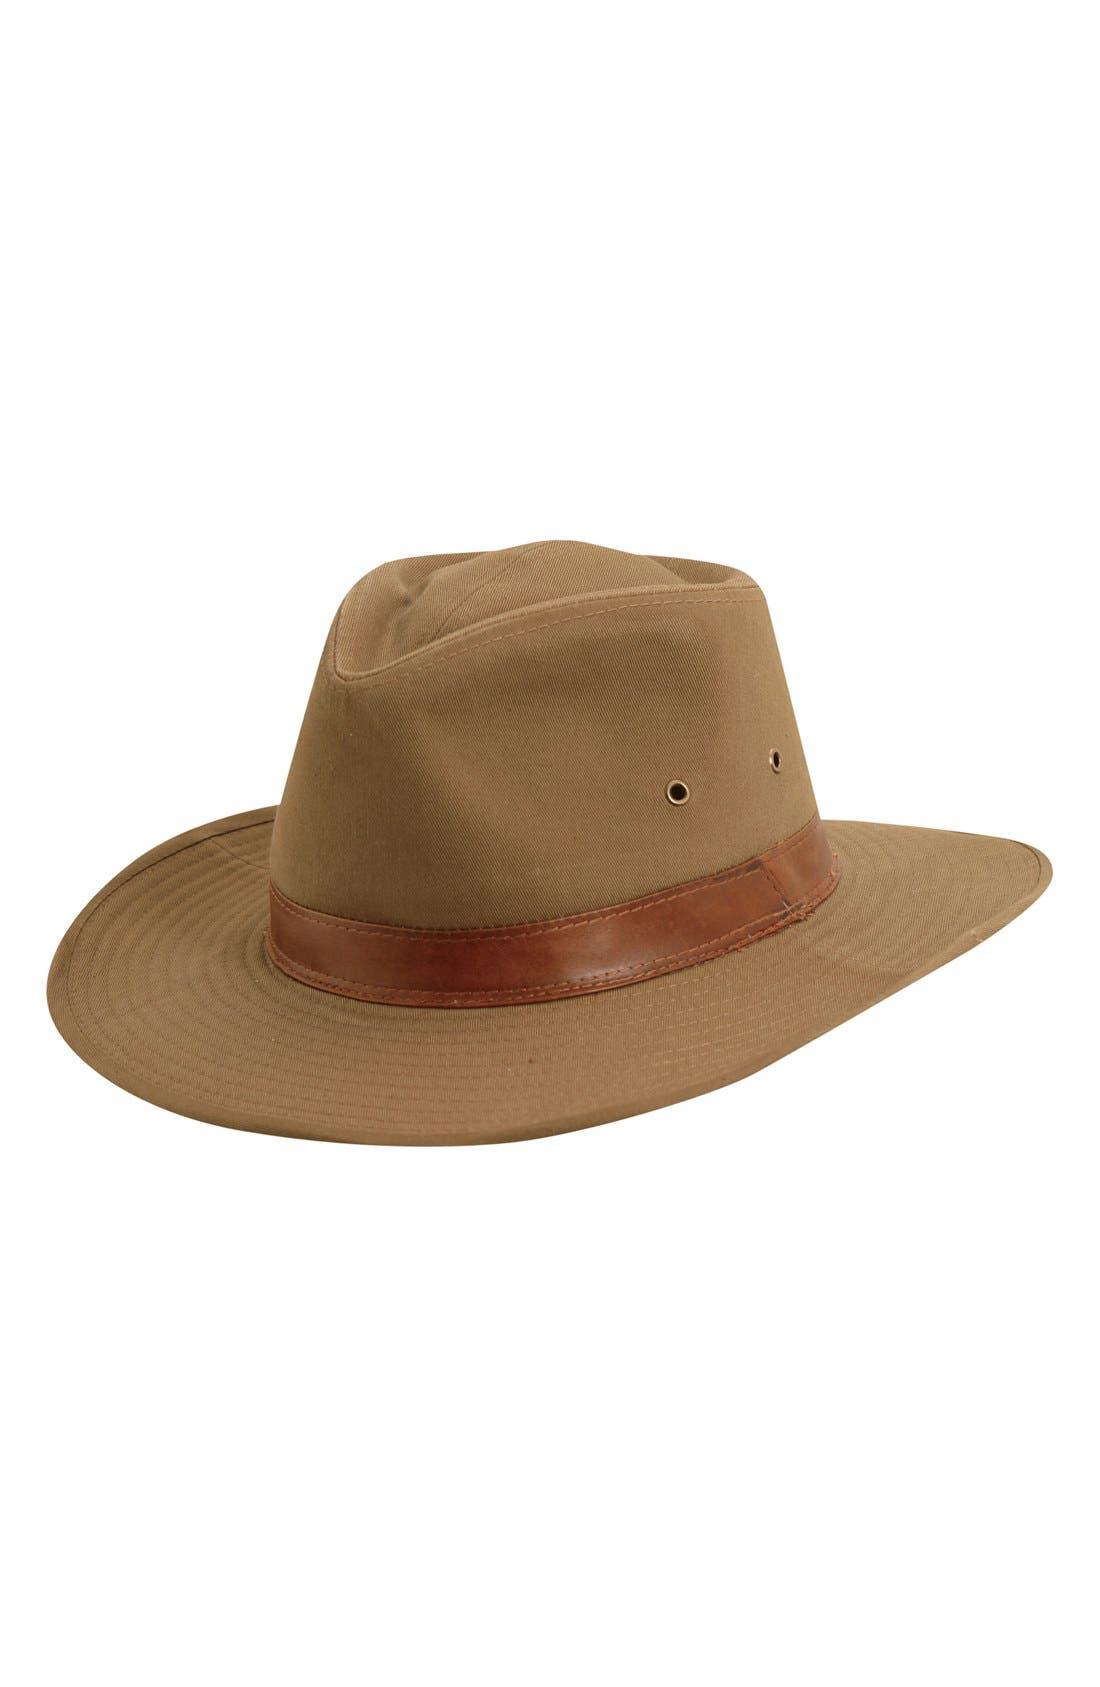 Dorfman Pacific Cotton Outback Hat